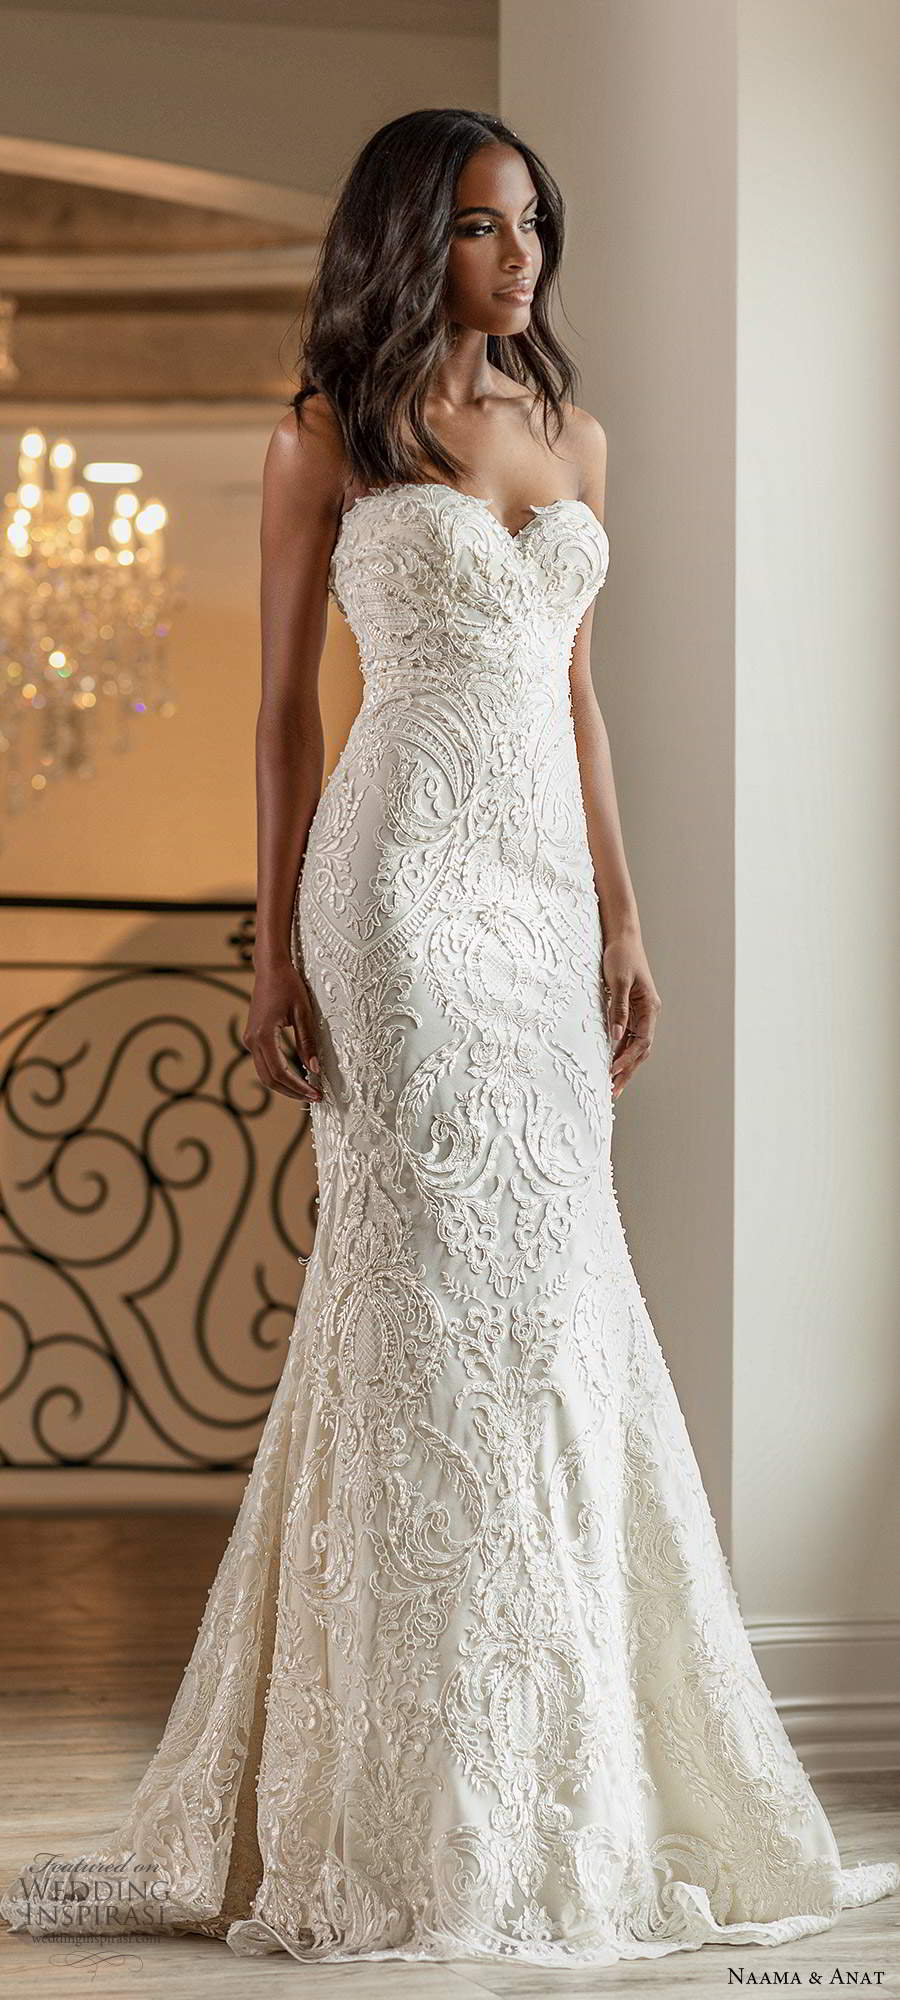 naama anat spring 2020 knottinghill bridal strapless sweetheart neckline fully embellished lace sheath glam wedding dress chapel train (8) mv